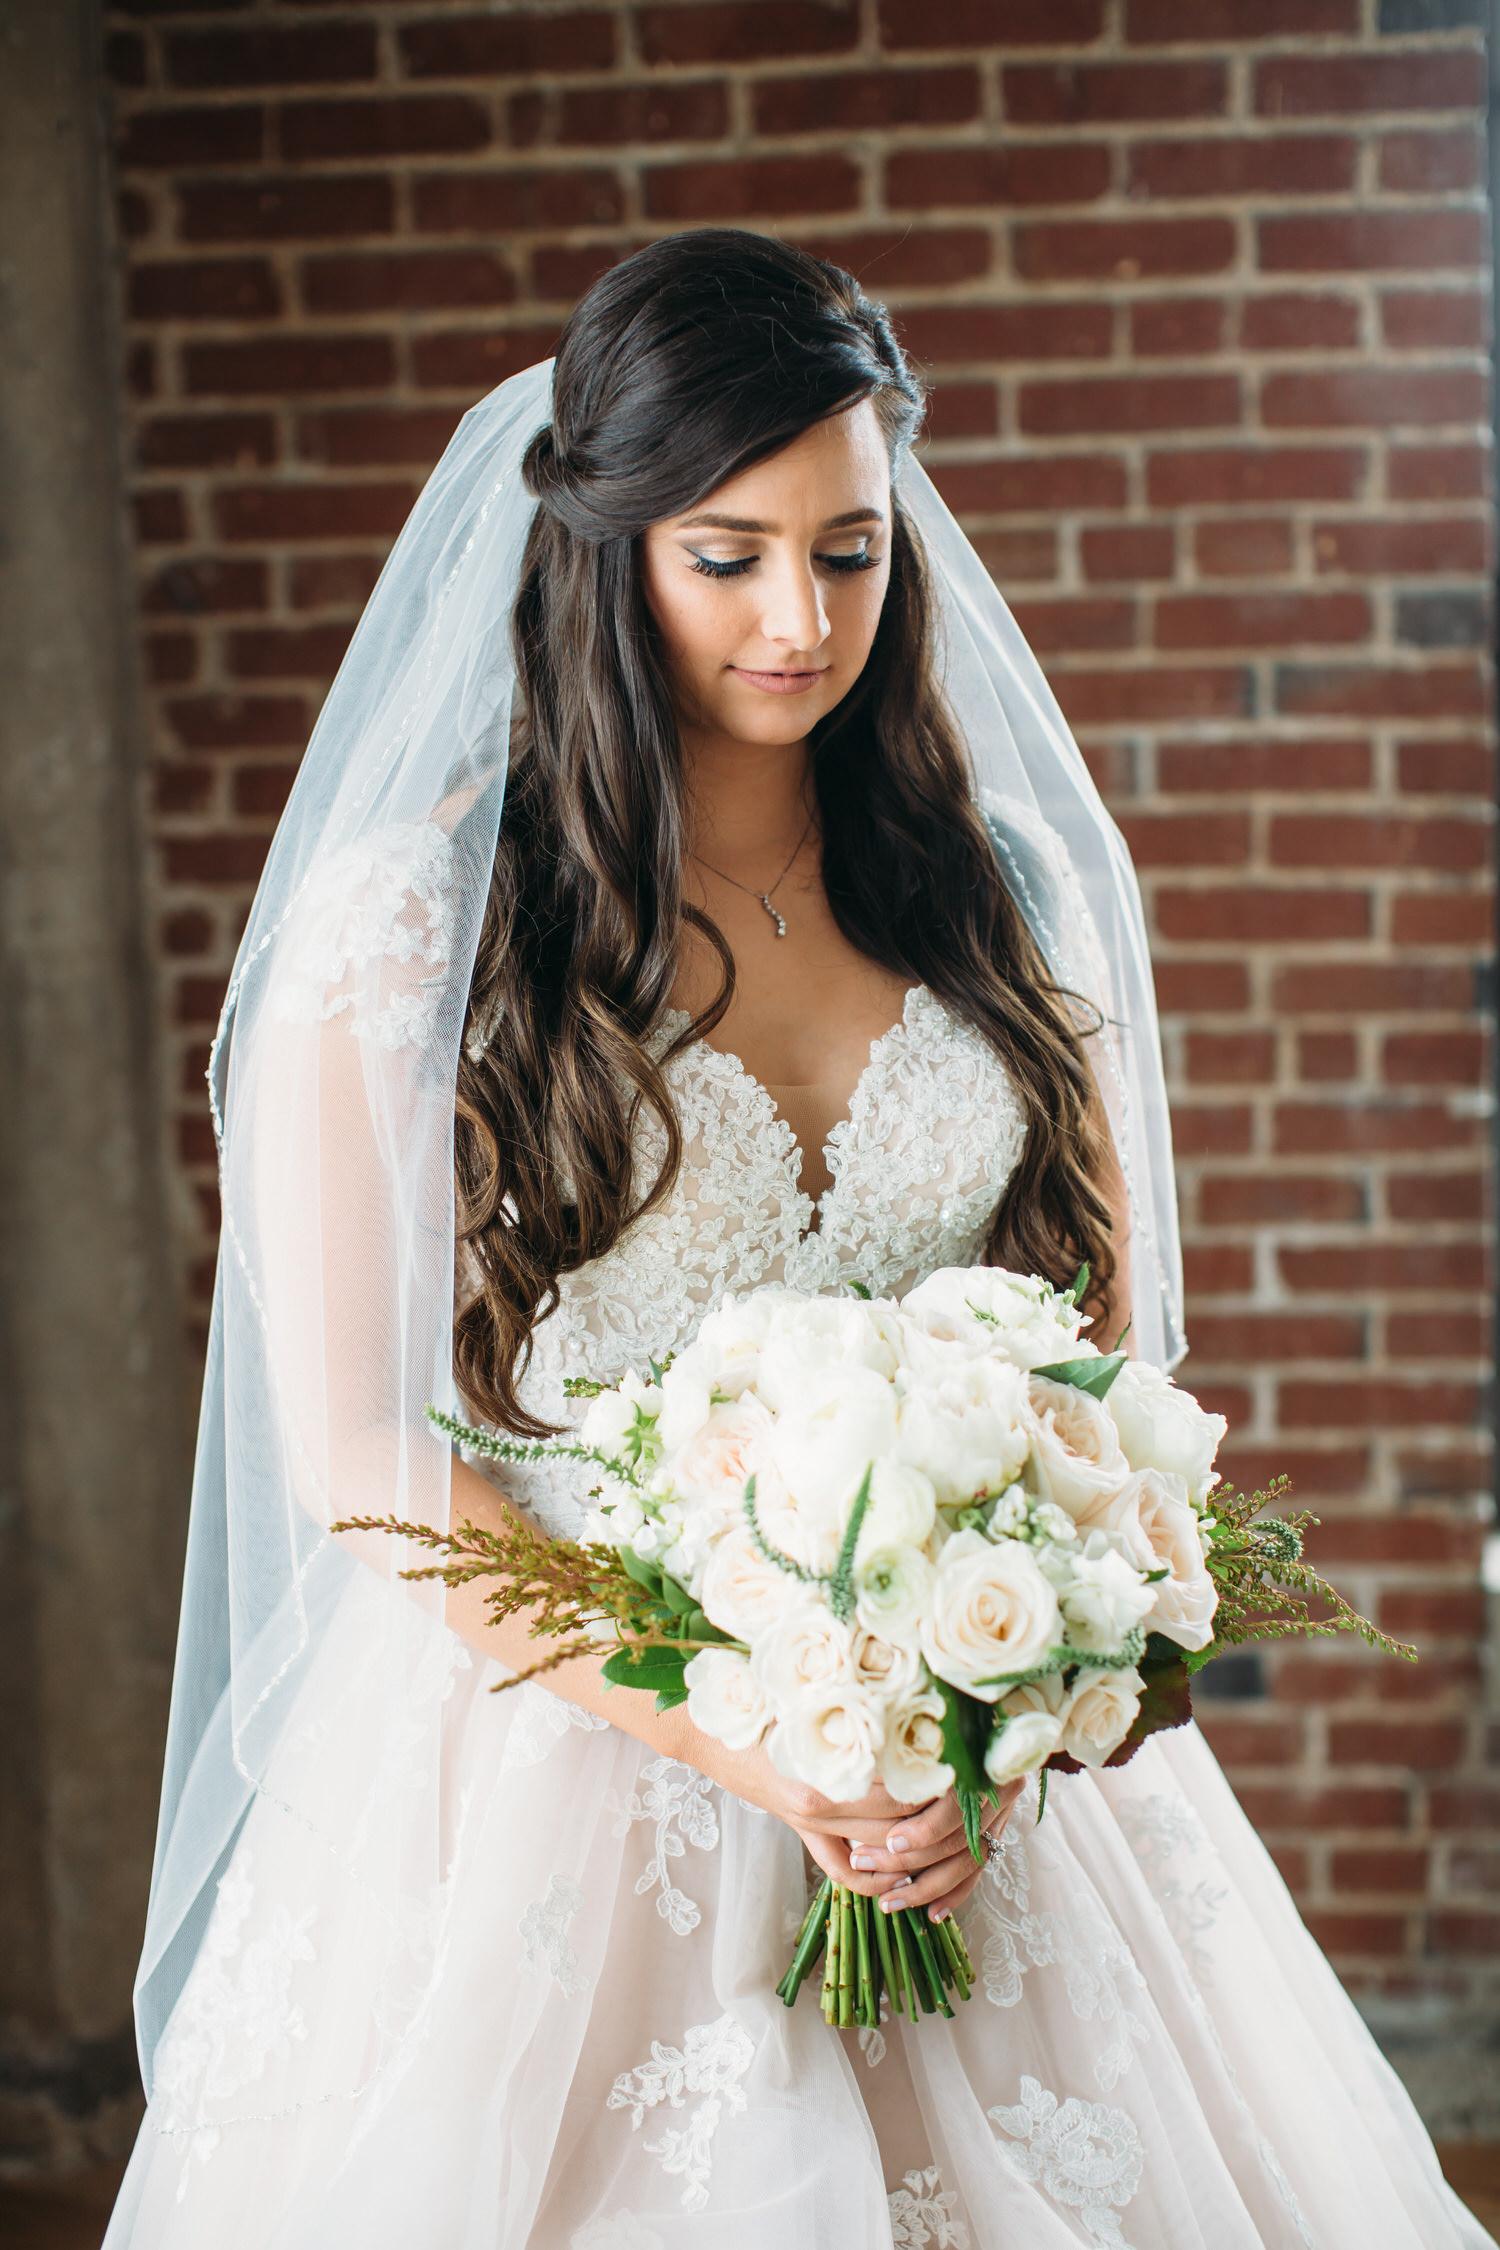 Bridal portrait of the bride with her wedding bouquet. St Louis wedding photographer